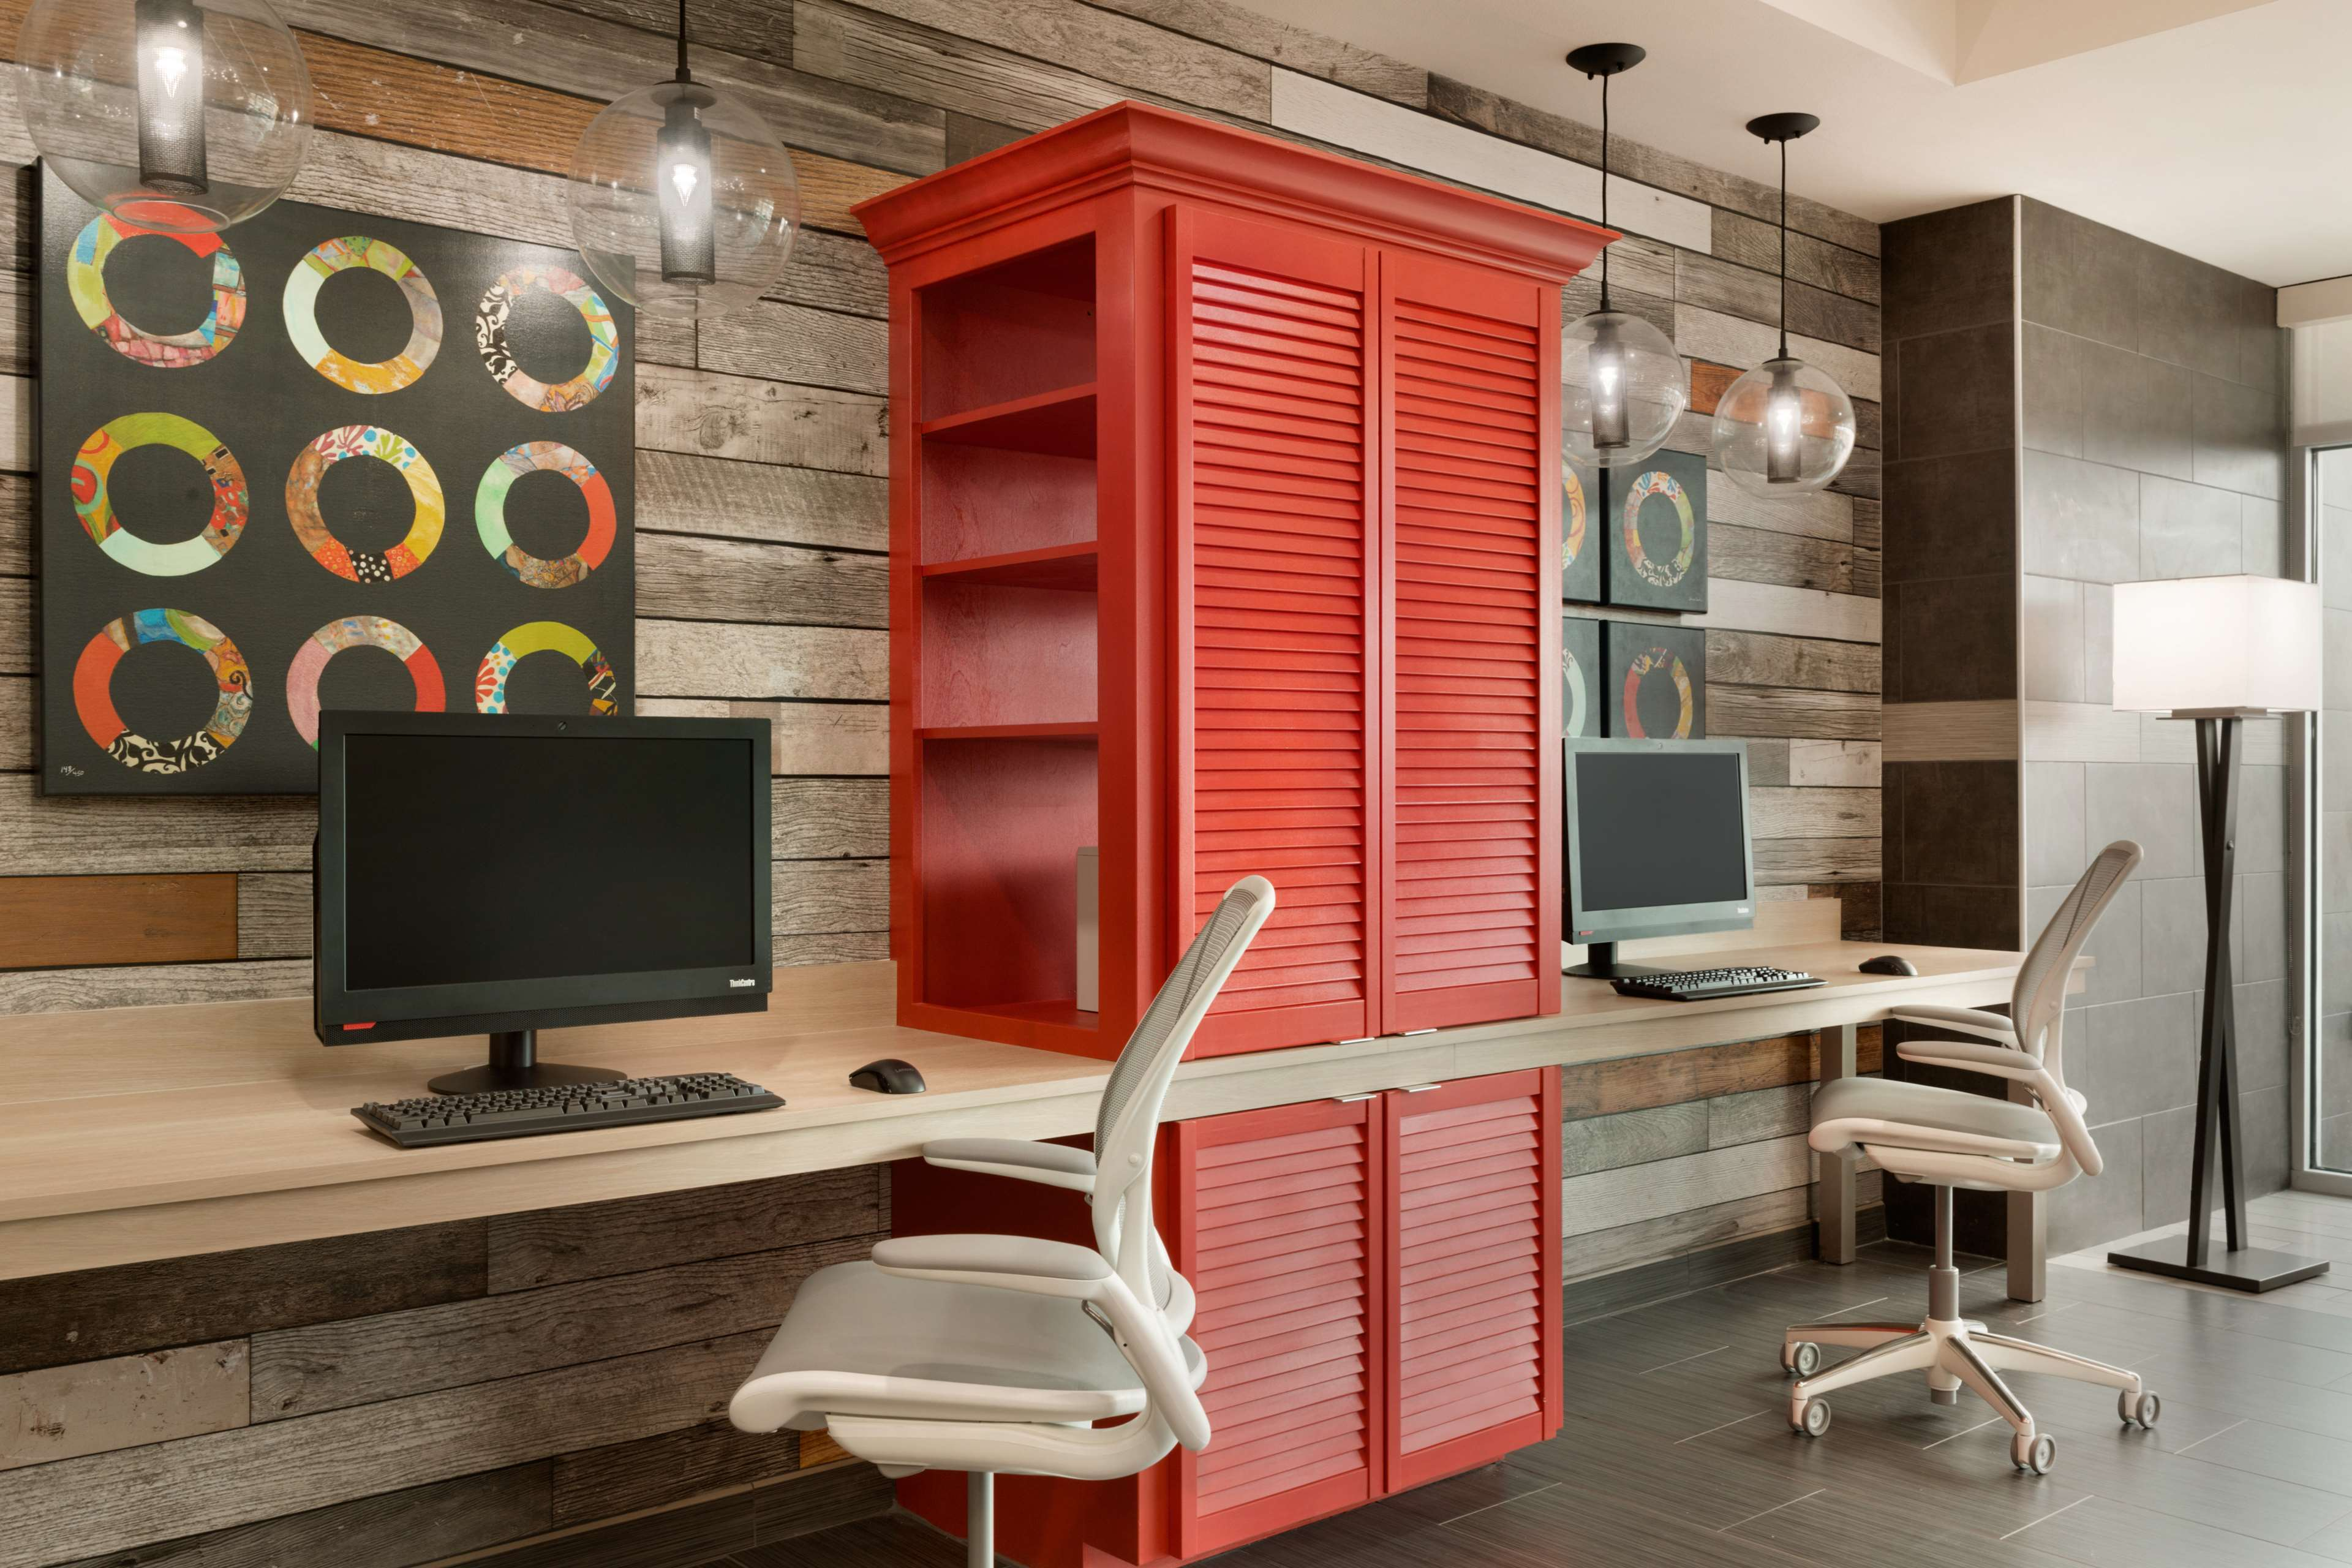 Home2 Suites by Hilton Houston/Webster image 21